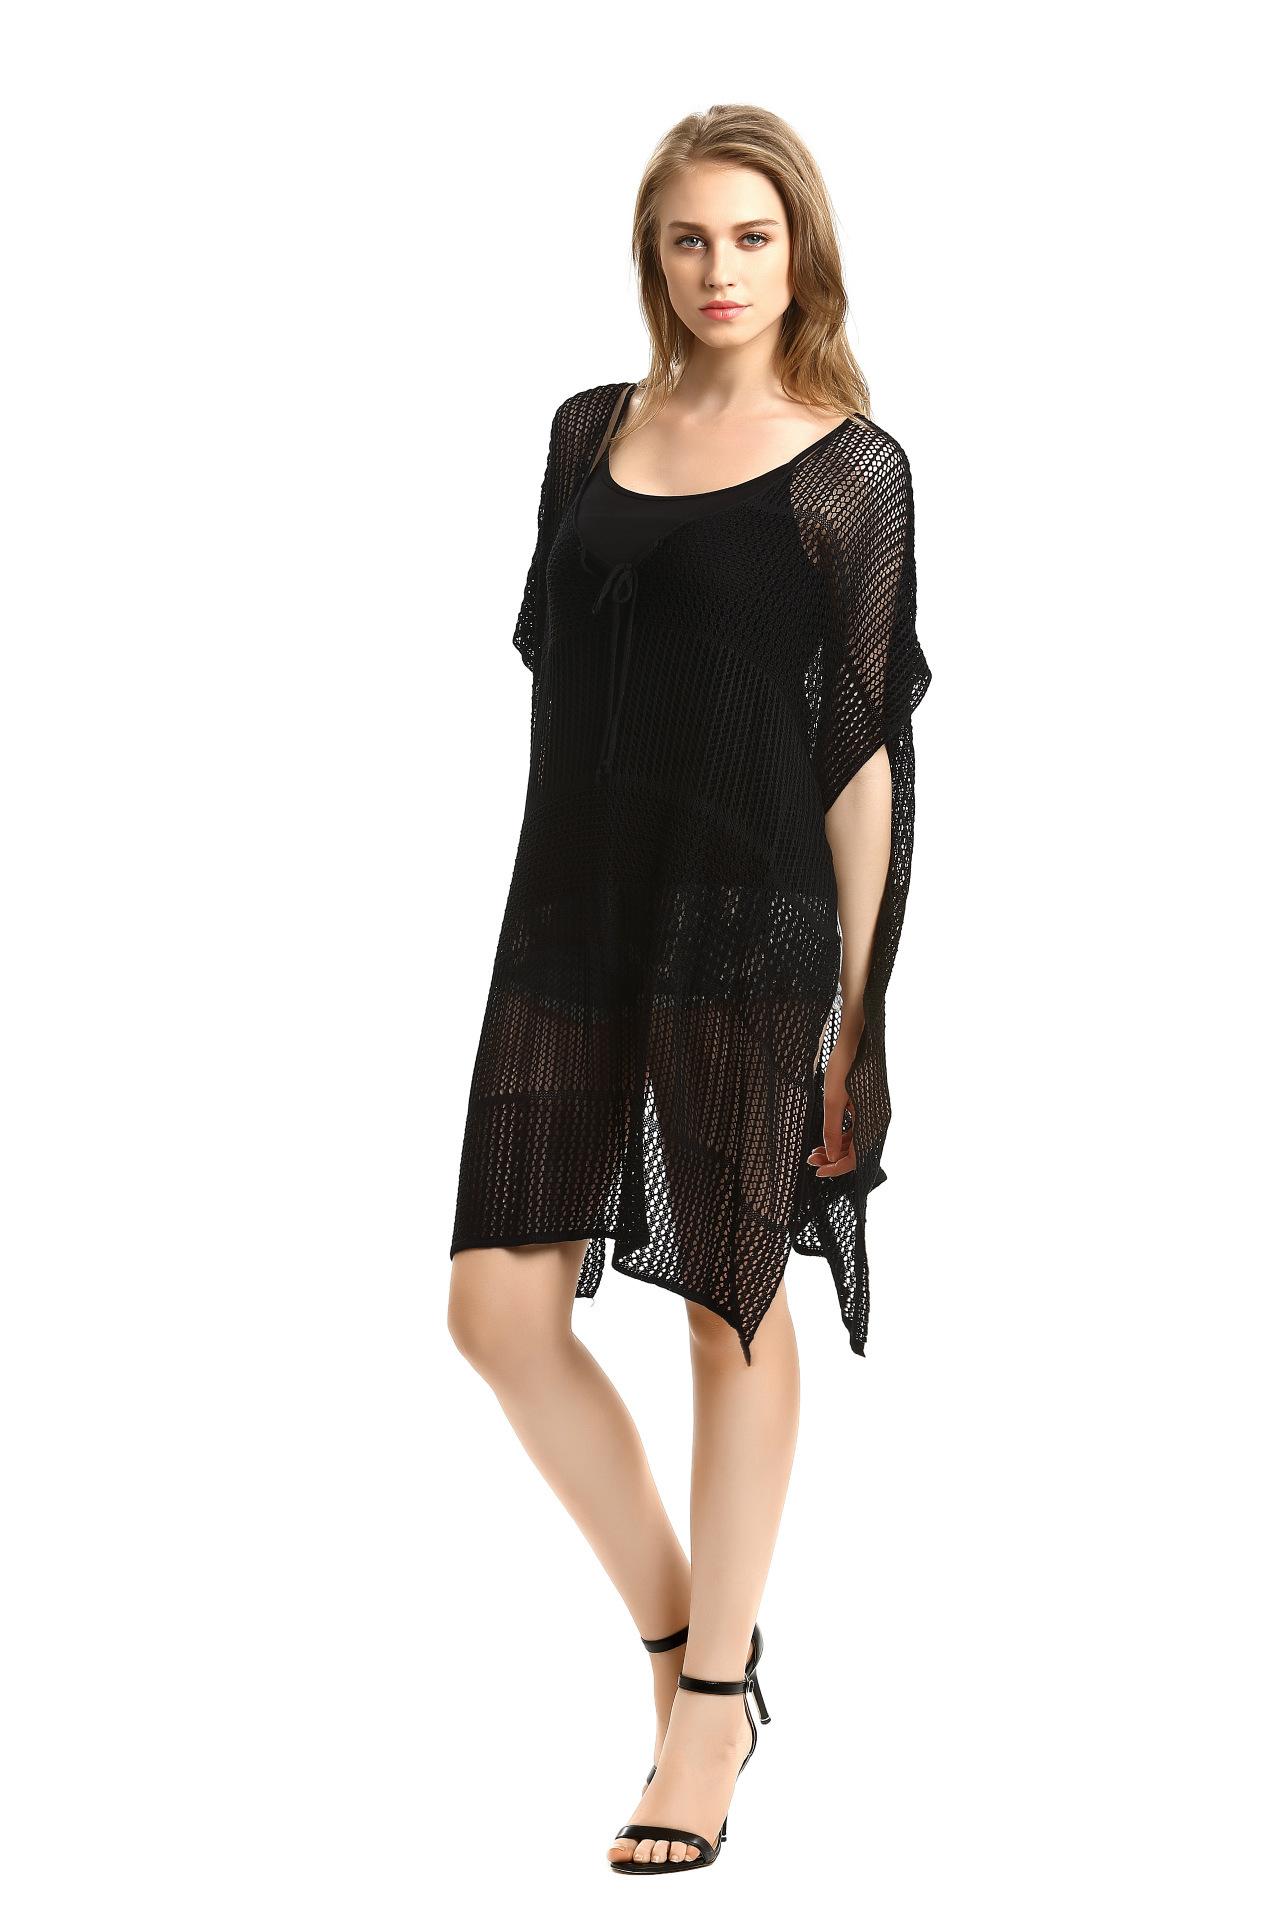 17 New Knitted Crochet Beach Tunic Bandage Bikini Cover-Ups Sexy Swimwear Cover up Women Beach Dress 8